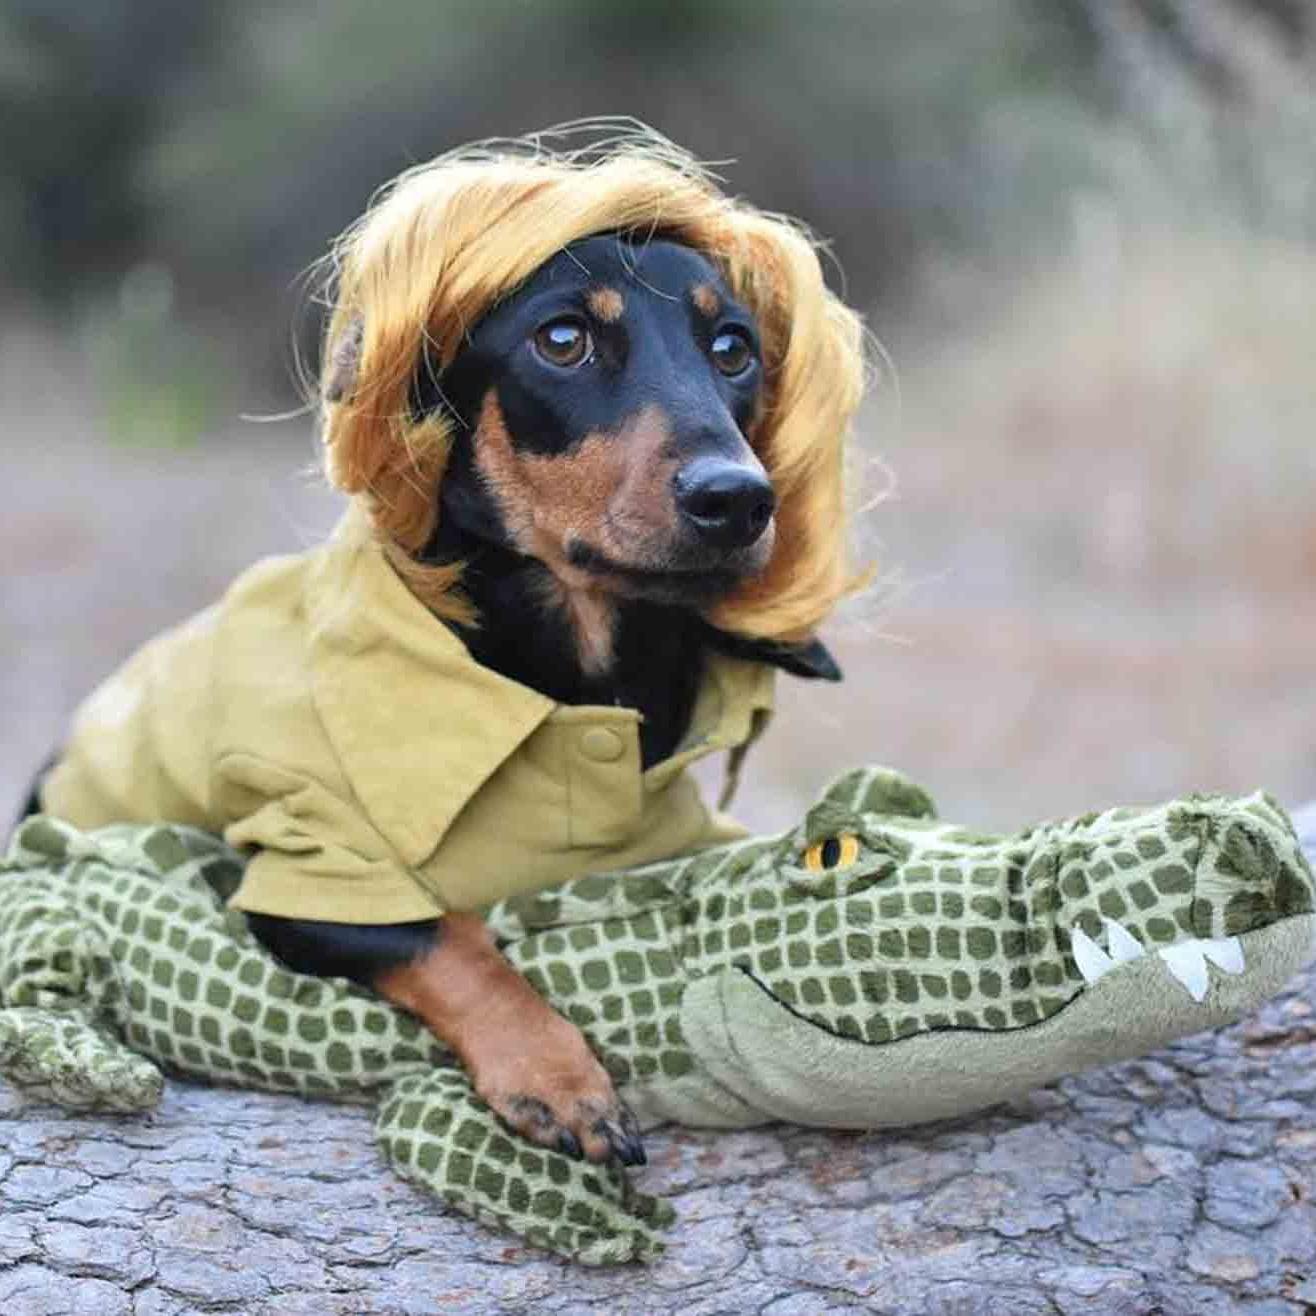 Weiner Dog Halloween Costumes.Photos Of Dachshunds In Halloween Costumes Popsugar Pets